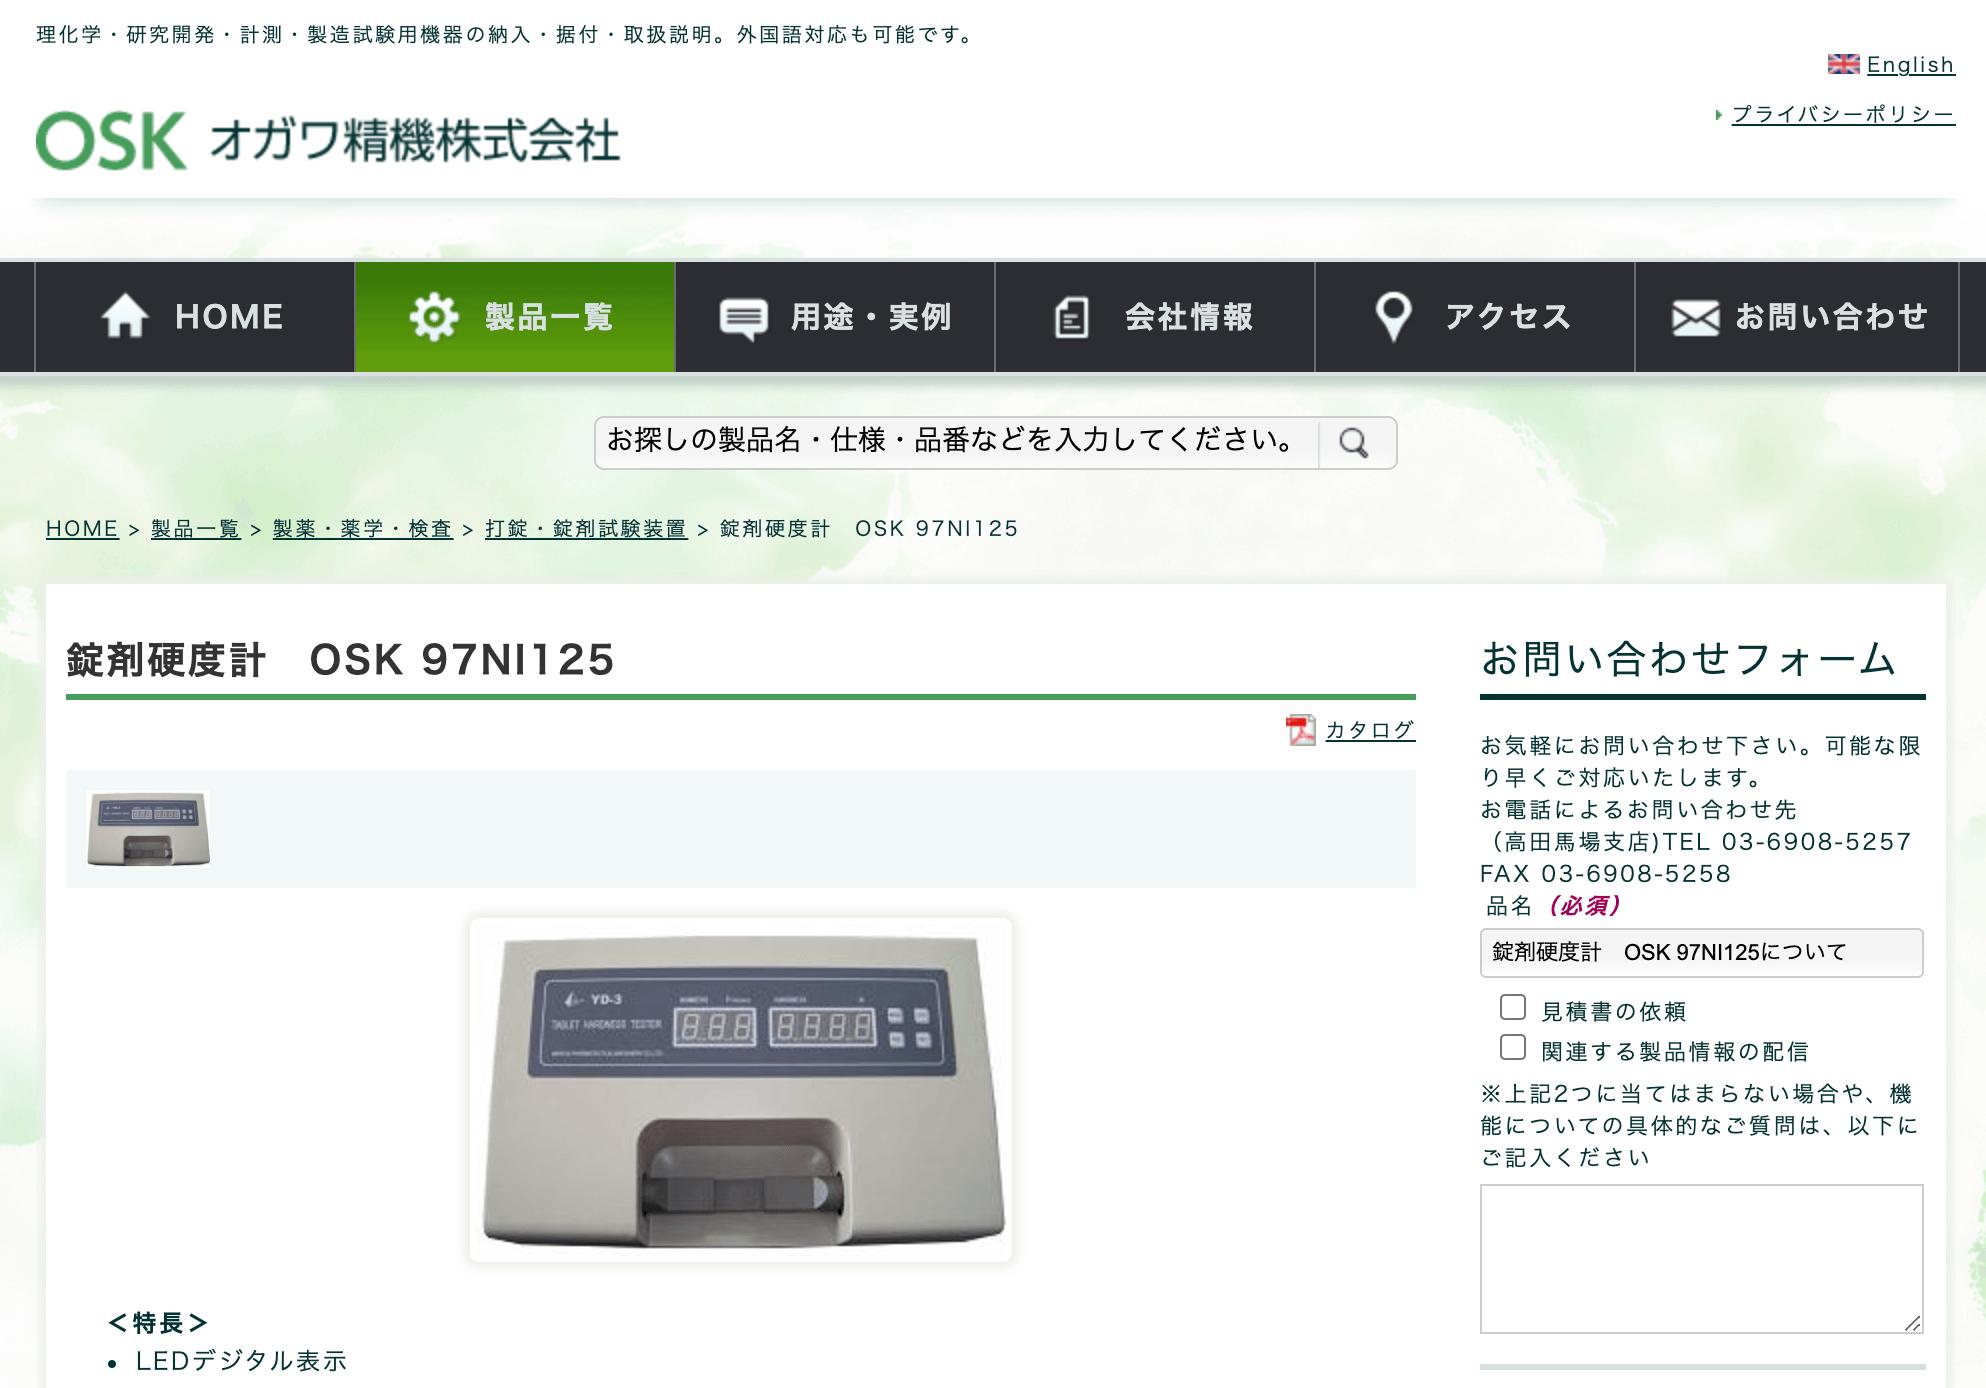 OSK 97NI125